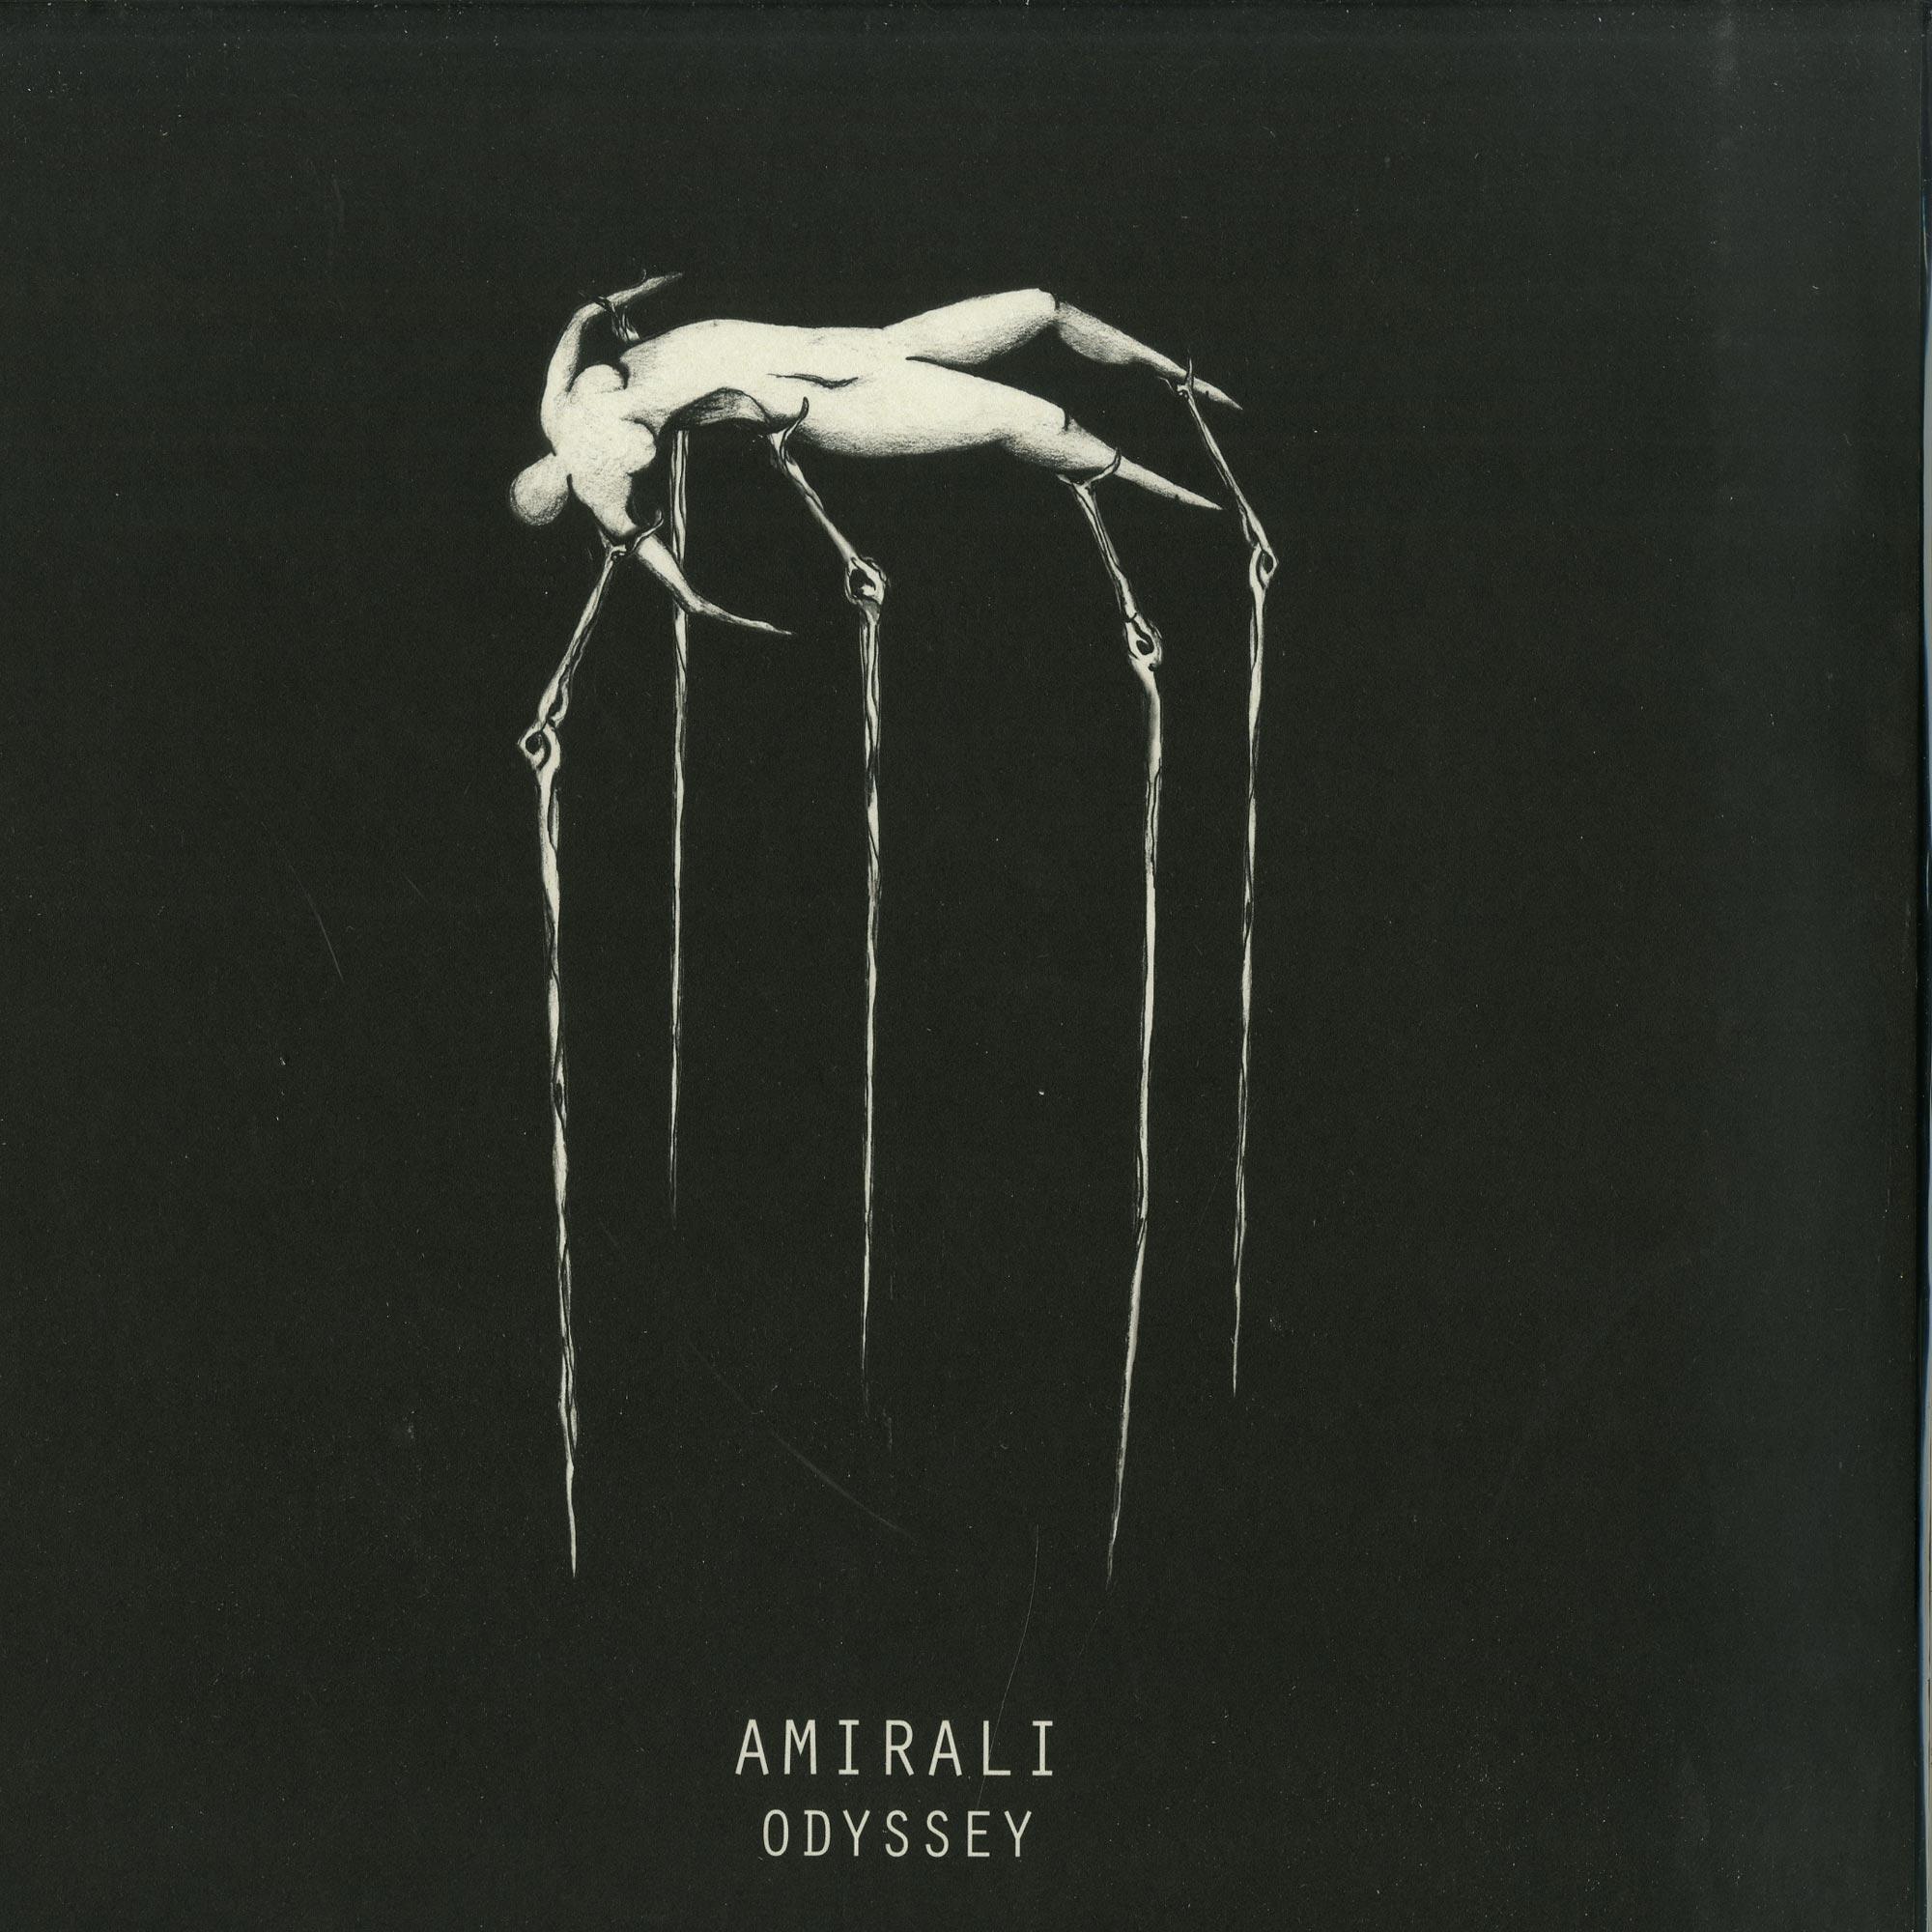 Amirali - ODYSSEY EP